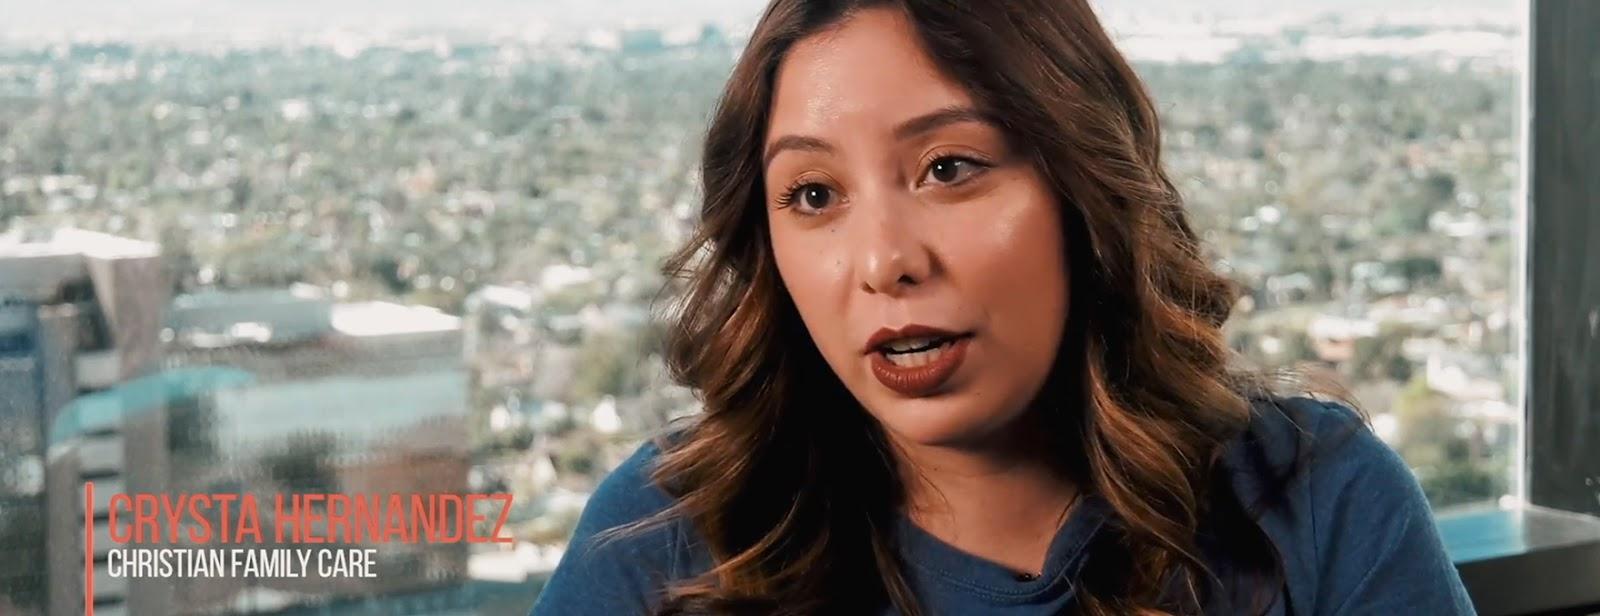 Crysta Hernandez - Christian Family Care